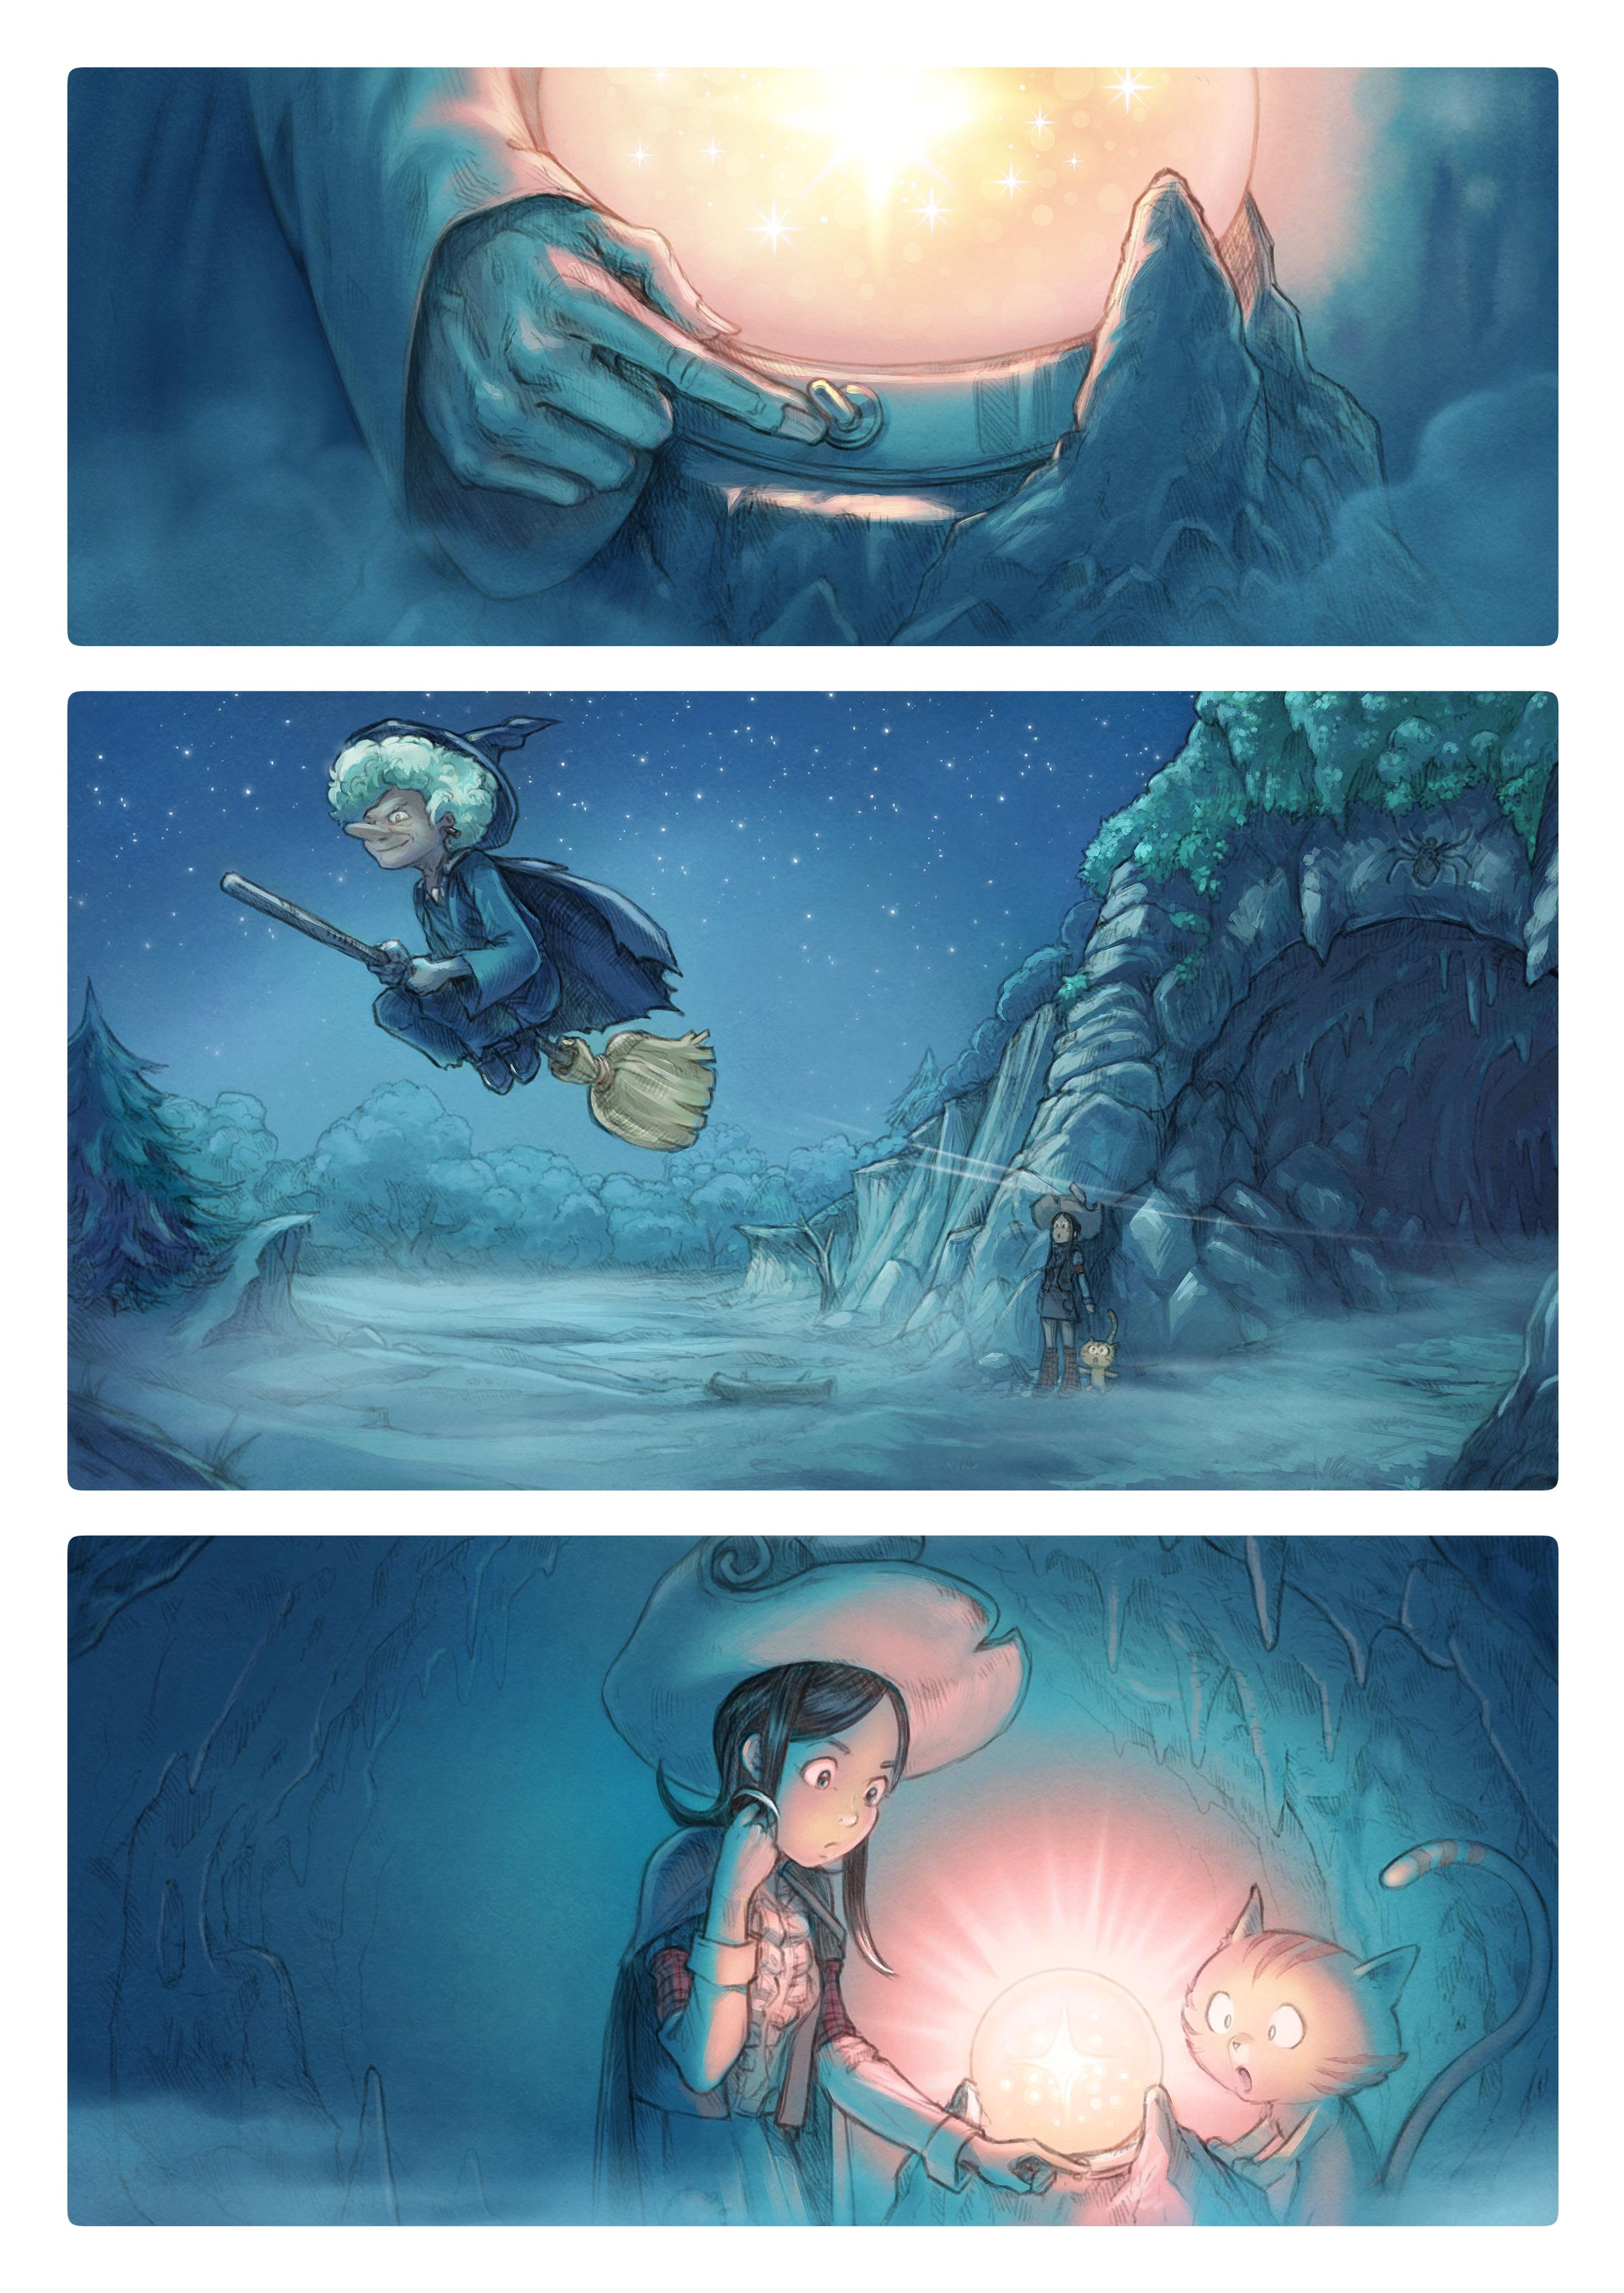 Episode 15: Krystallkulen, Page 2